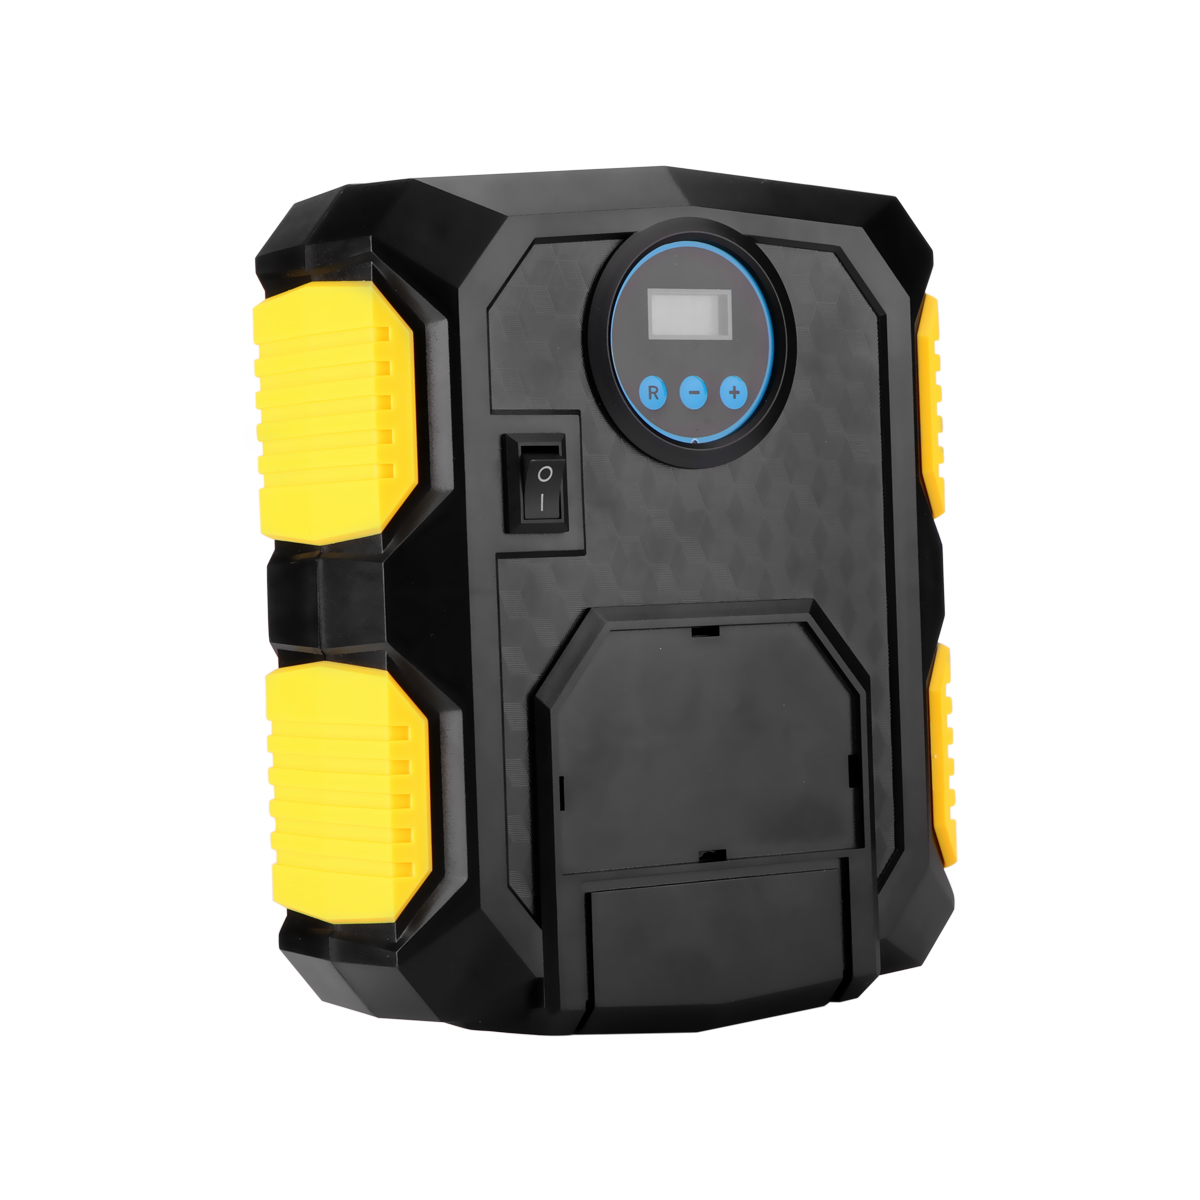 Onever Portable Tire Air Compressor 7